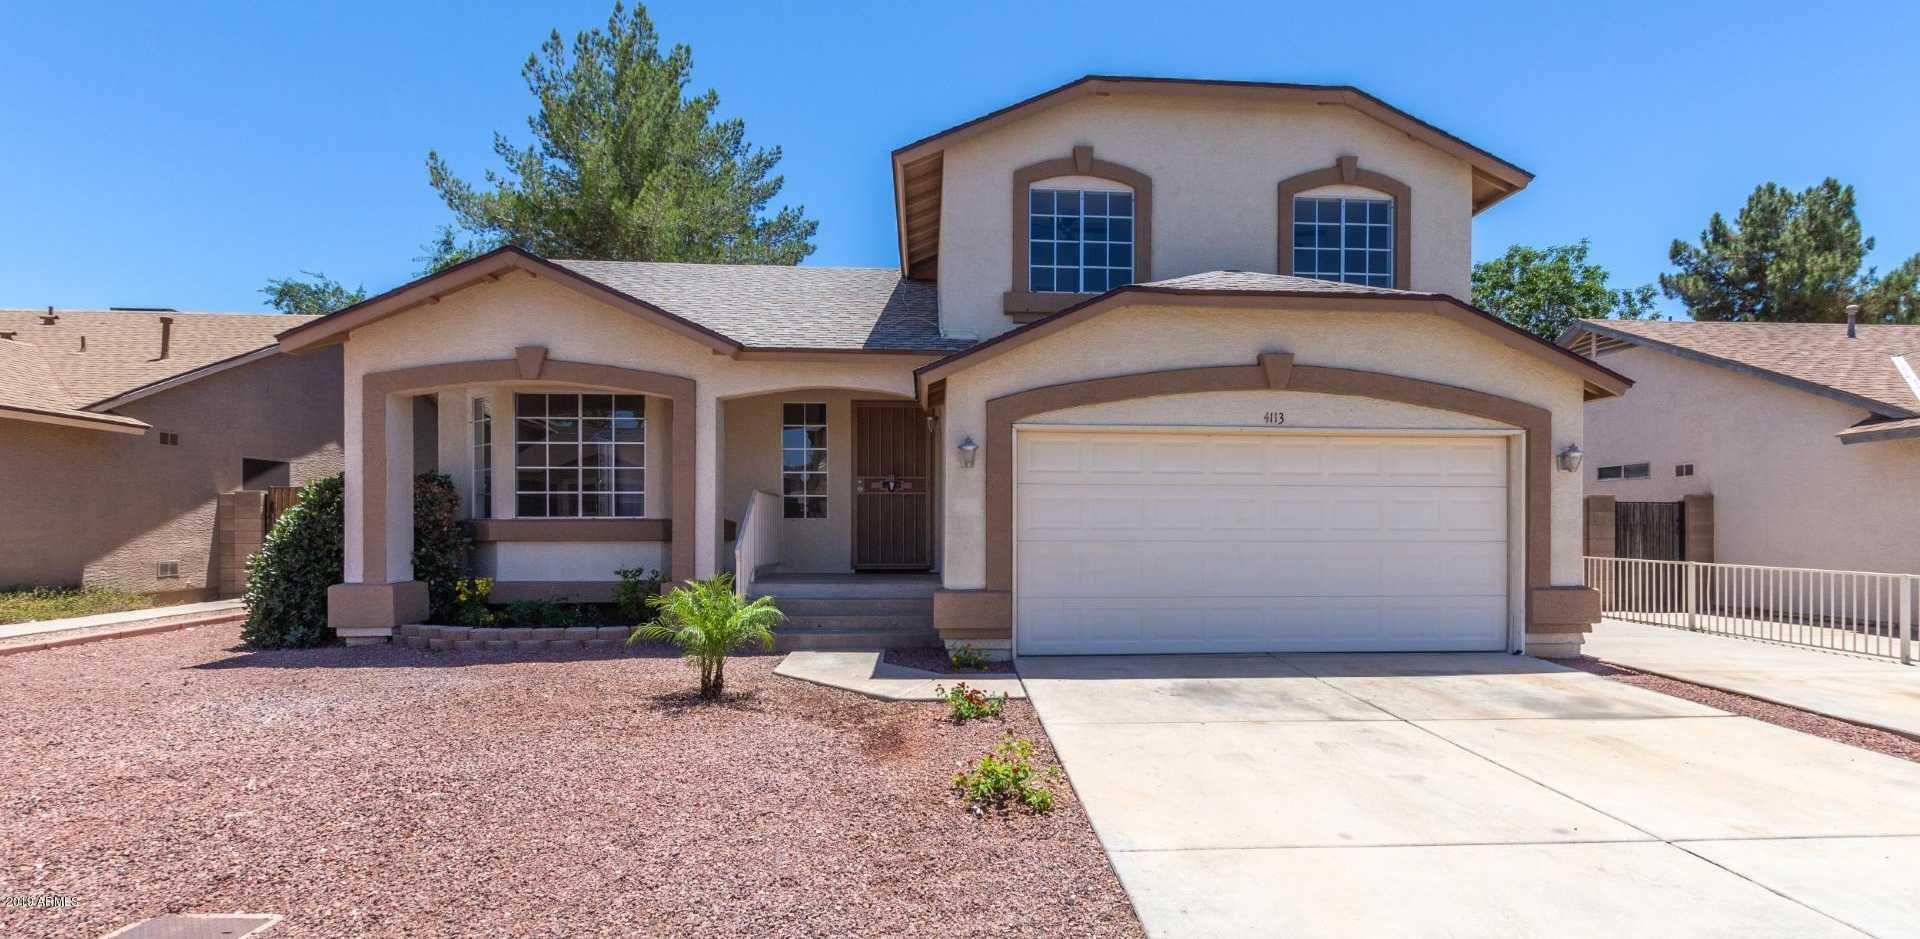 $315,000 - 3Br/3Ba - Home for Sale in Upland Hills, Glendale